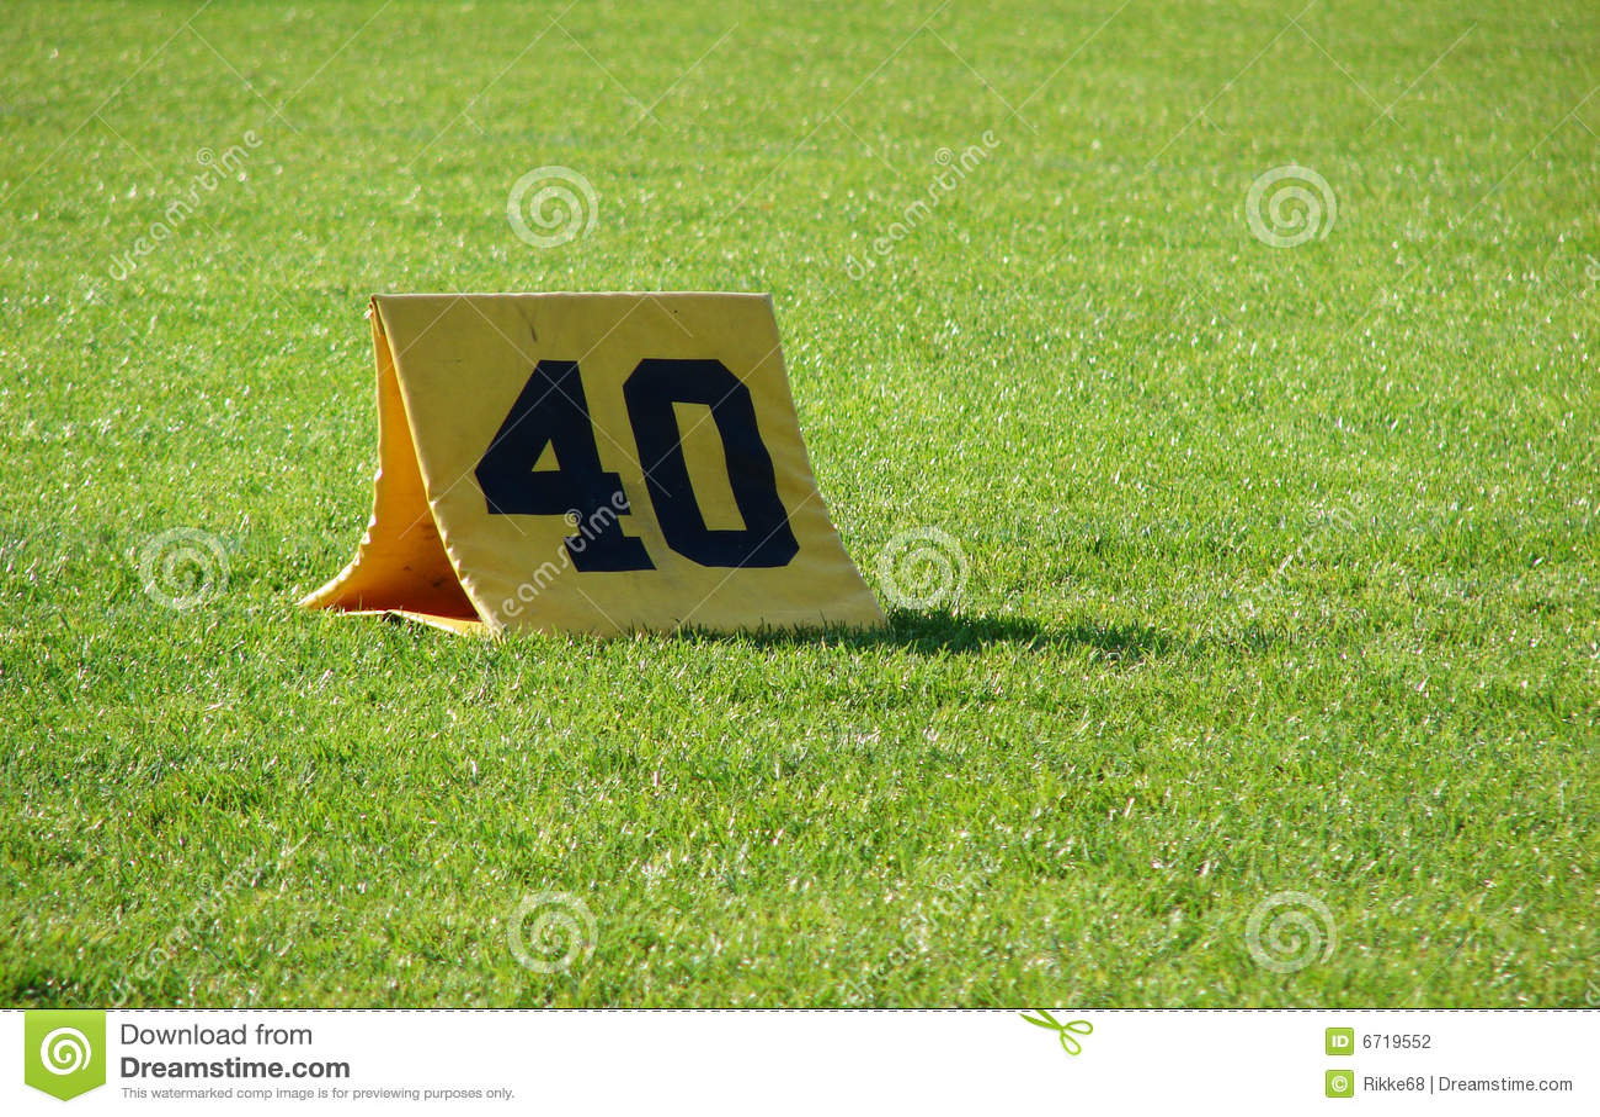 40 Yards